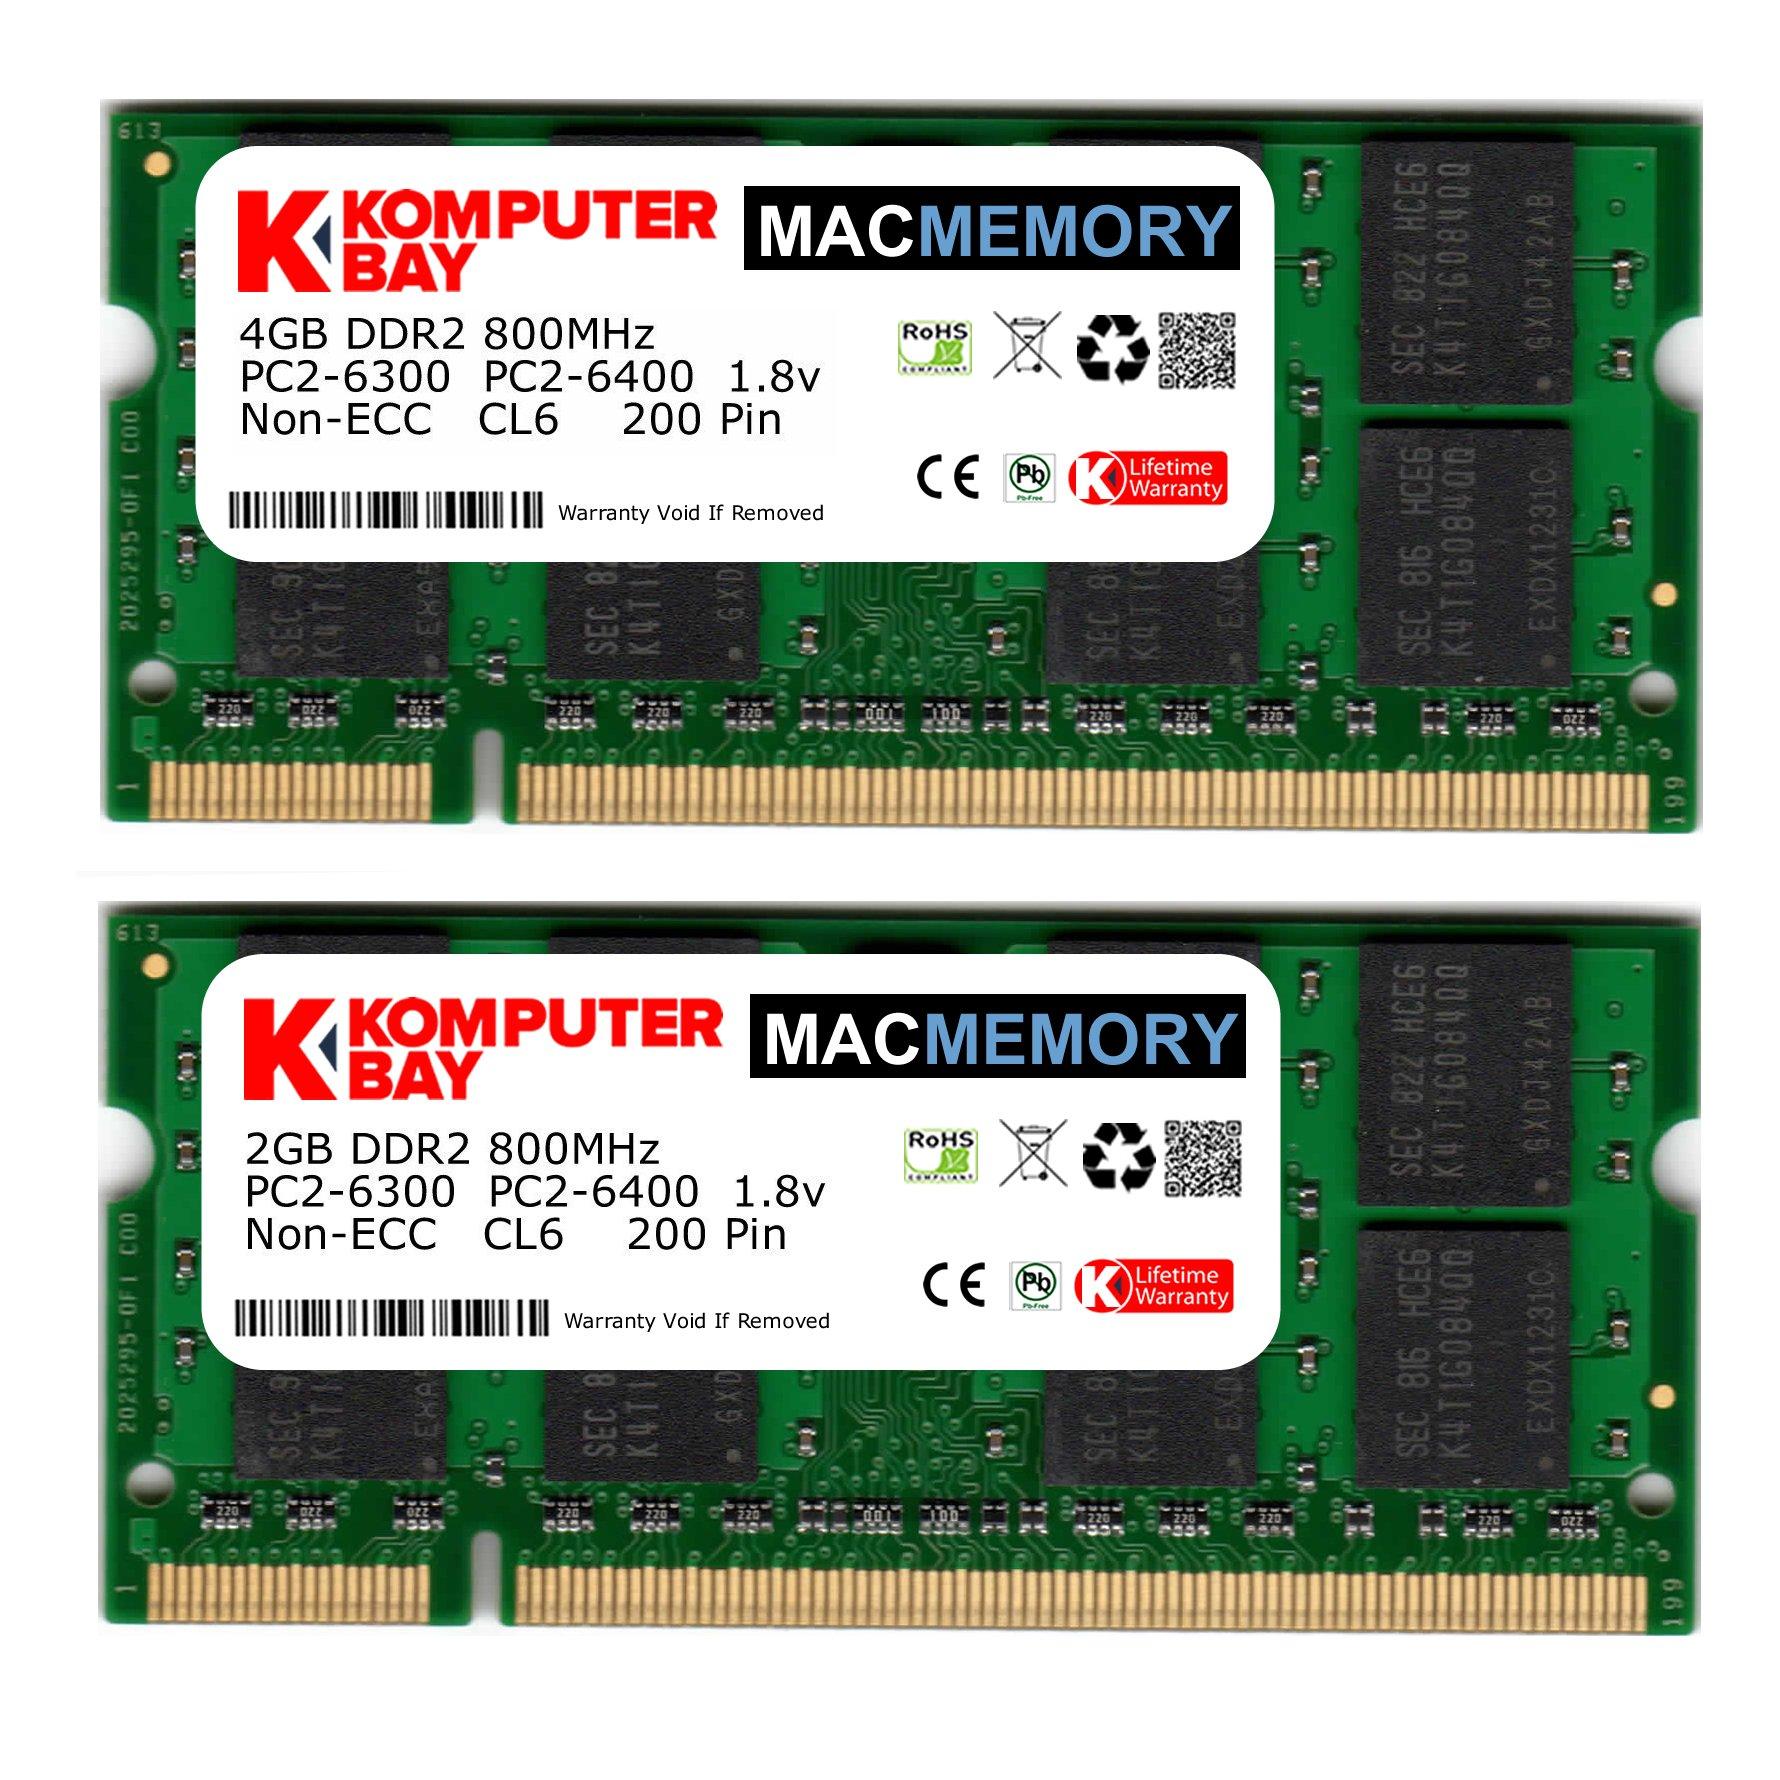 Memoria RAM 4GB Komputerbay MAC 6GB Kit ( + 2GB Modules) PC2-6300 800MHz DDR2 SODIMM para Apple iMac 20 2008 2.4GHz 2.66